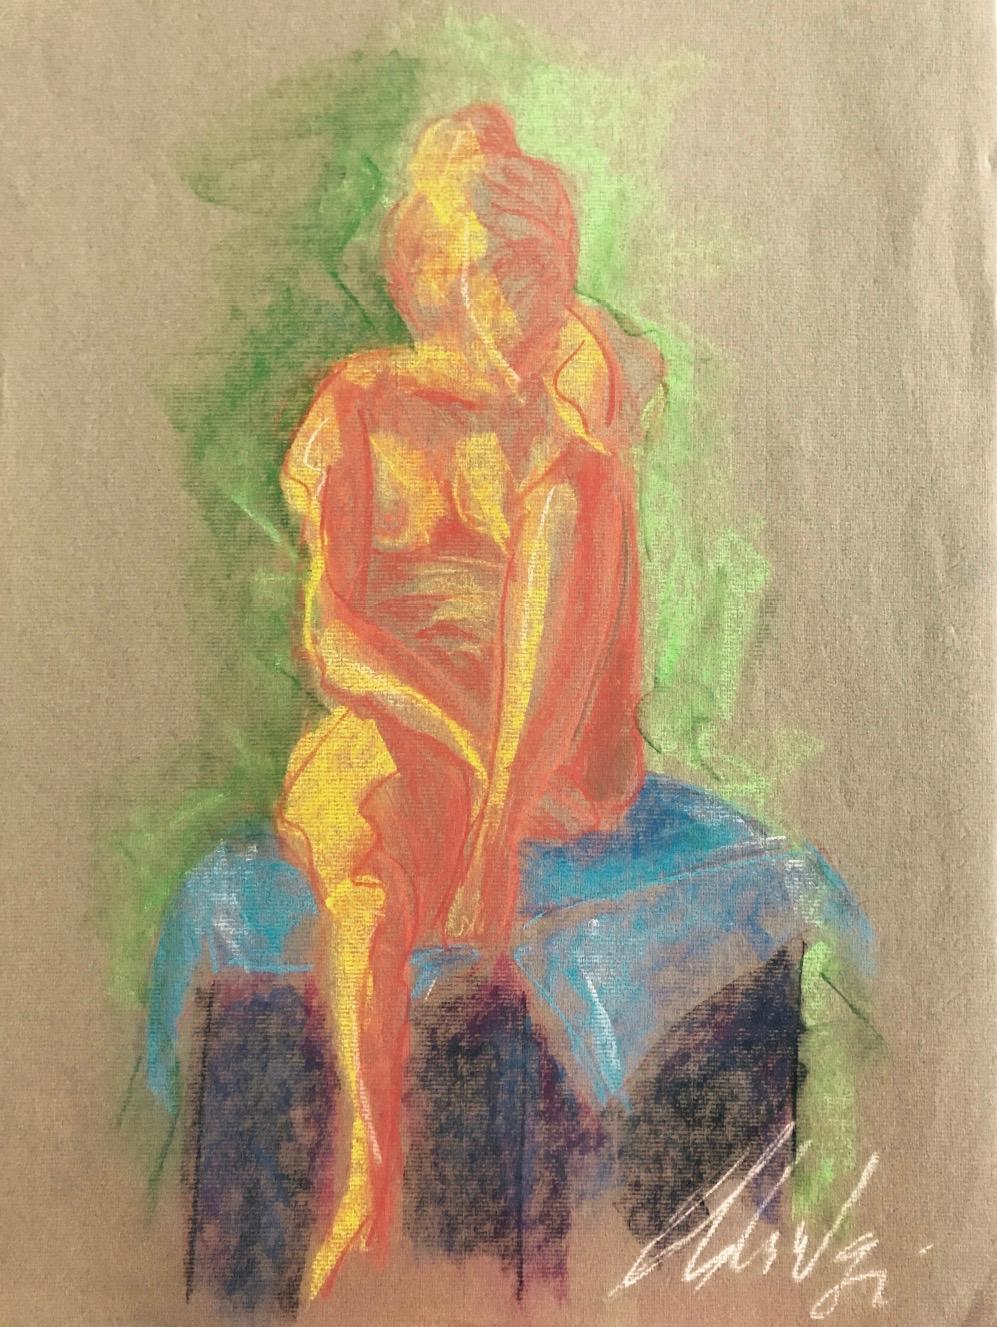 Painting 2 2.jpg